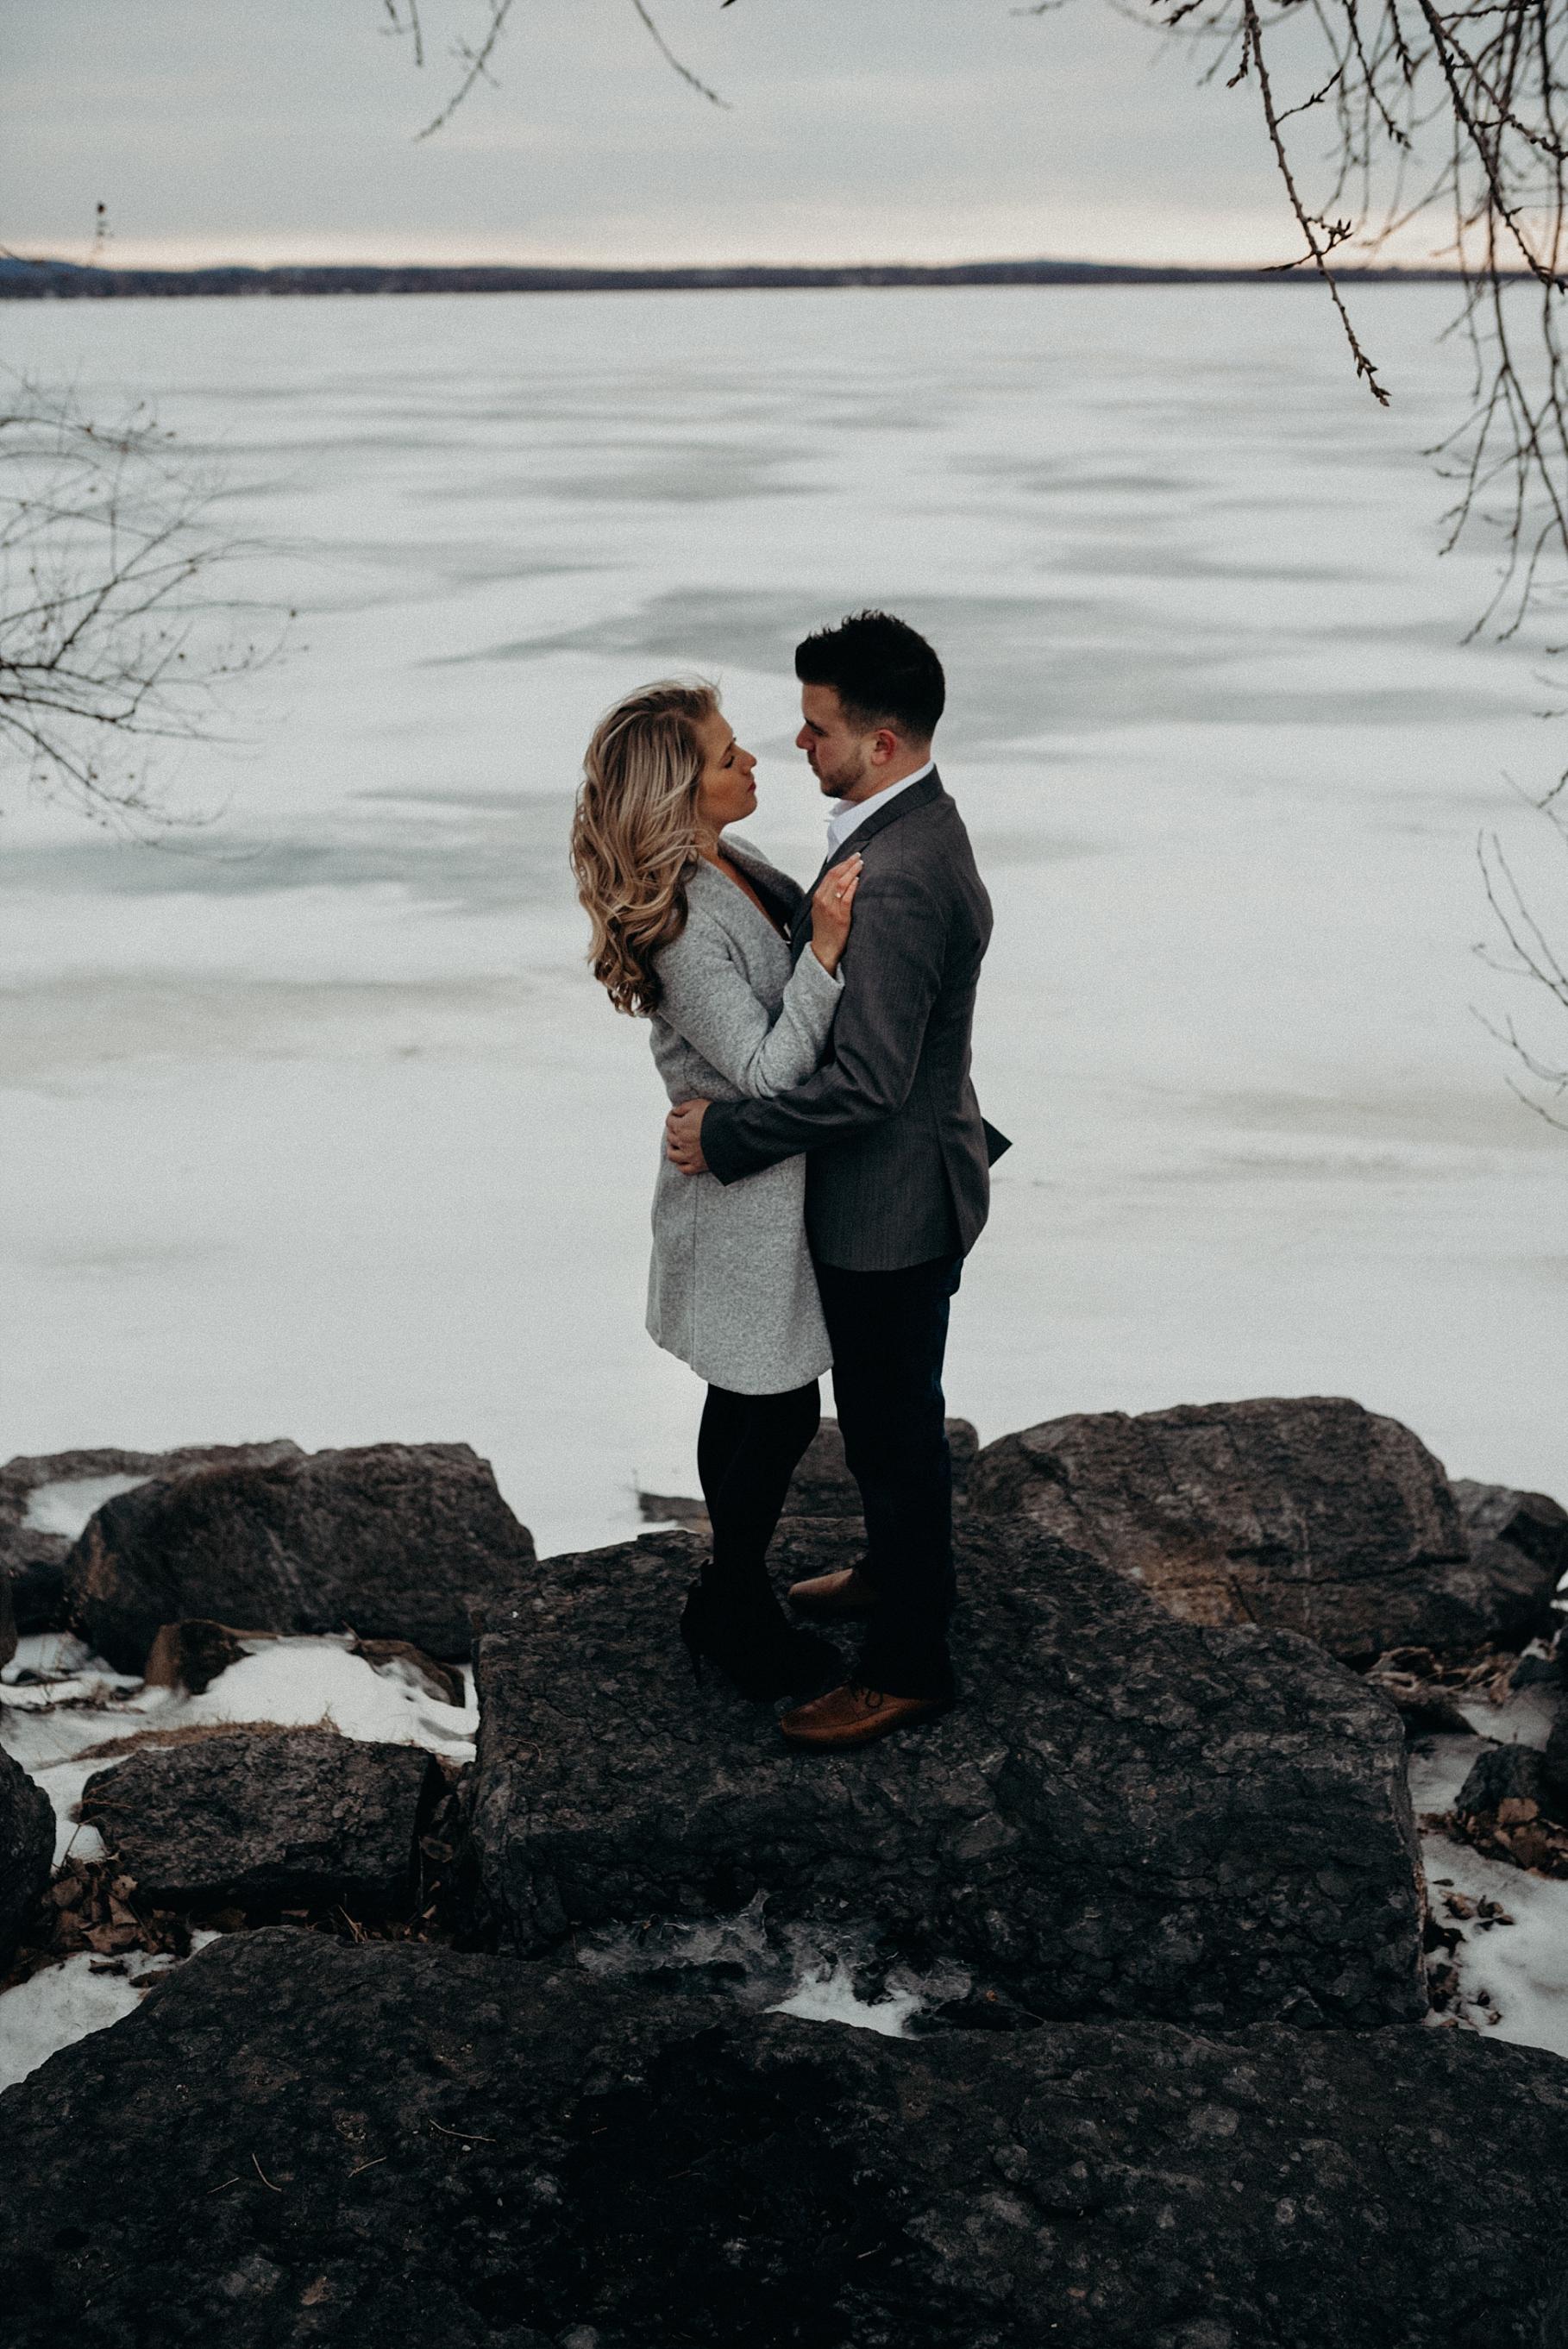 Mocha Tree Studios Ottawa Toronto Montreal Wedding and Engagement Photographer and Videographer Dark Moody Intimate Authentic Modern Romantic Cinematic Best Candid Nepean Sailing Club Andew Haydon Park 8